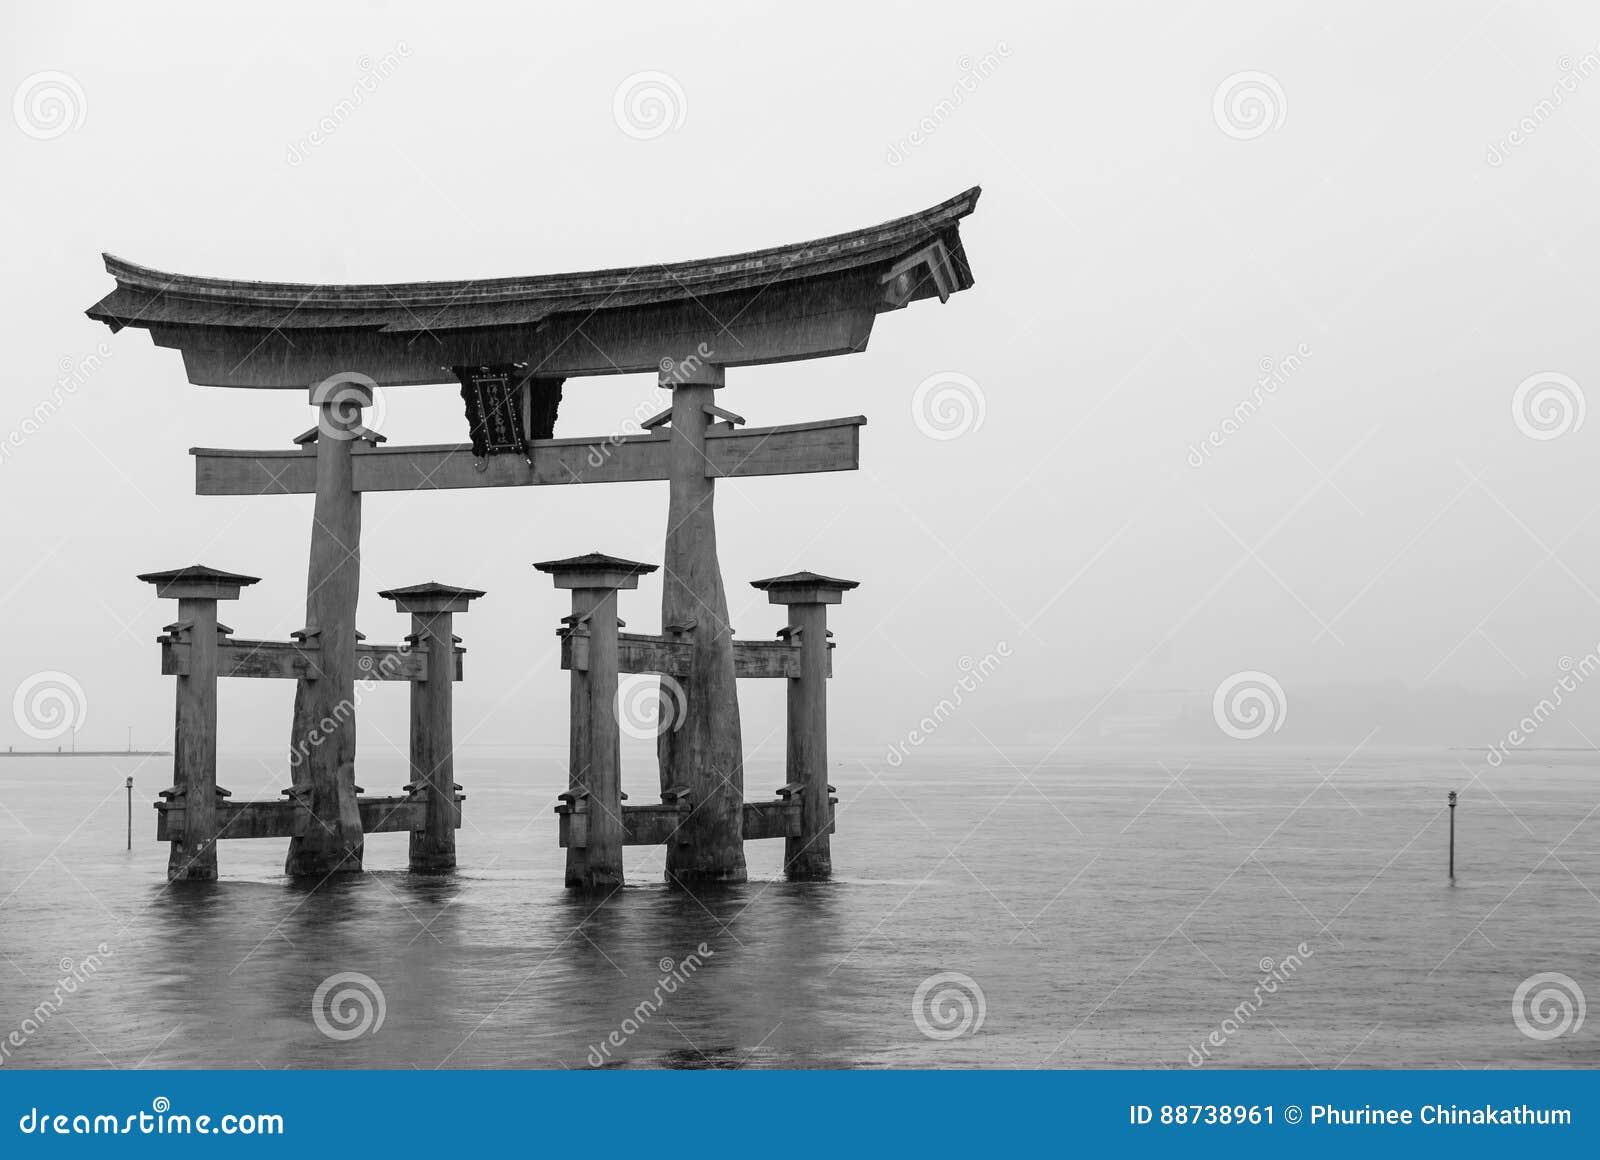 De Drijvende Torii-poort